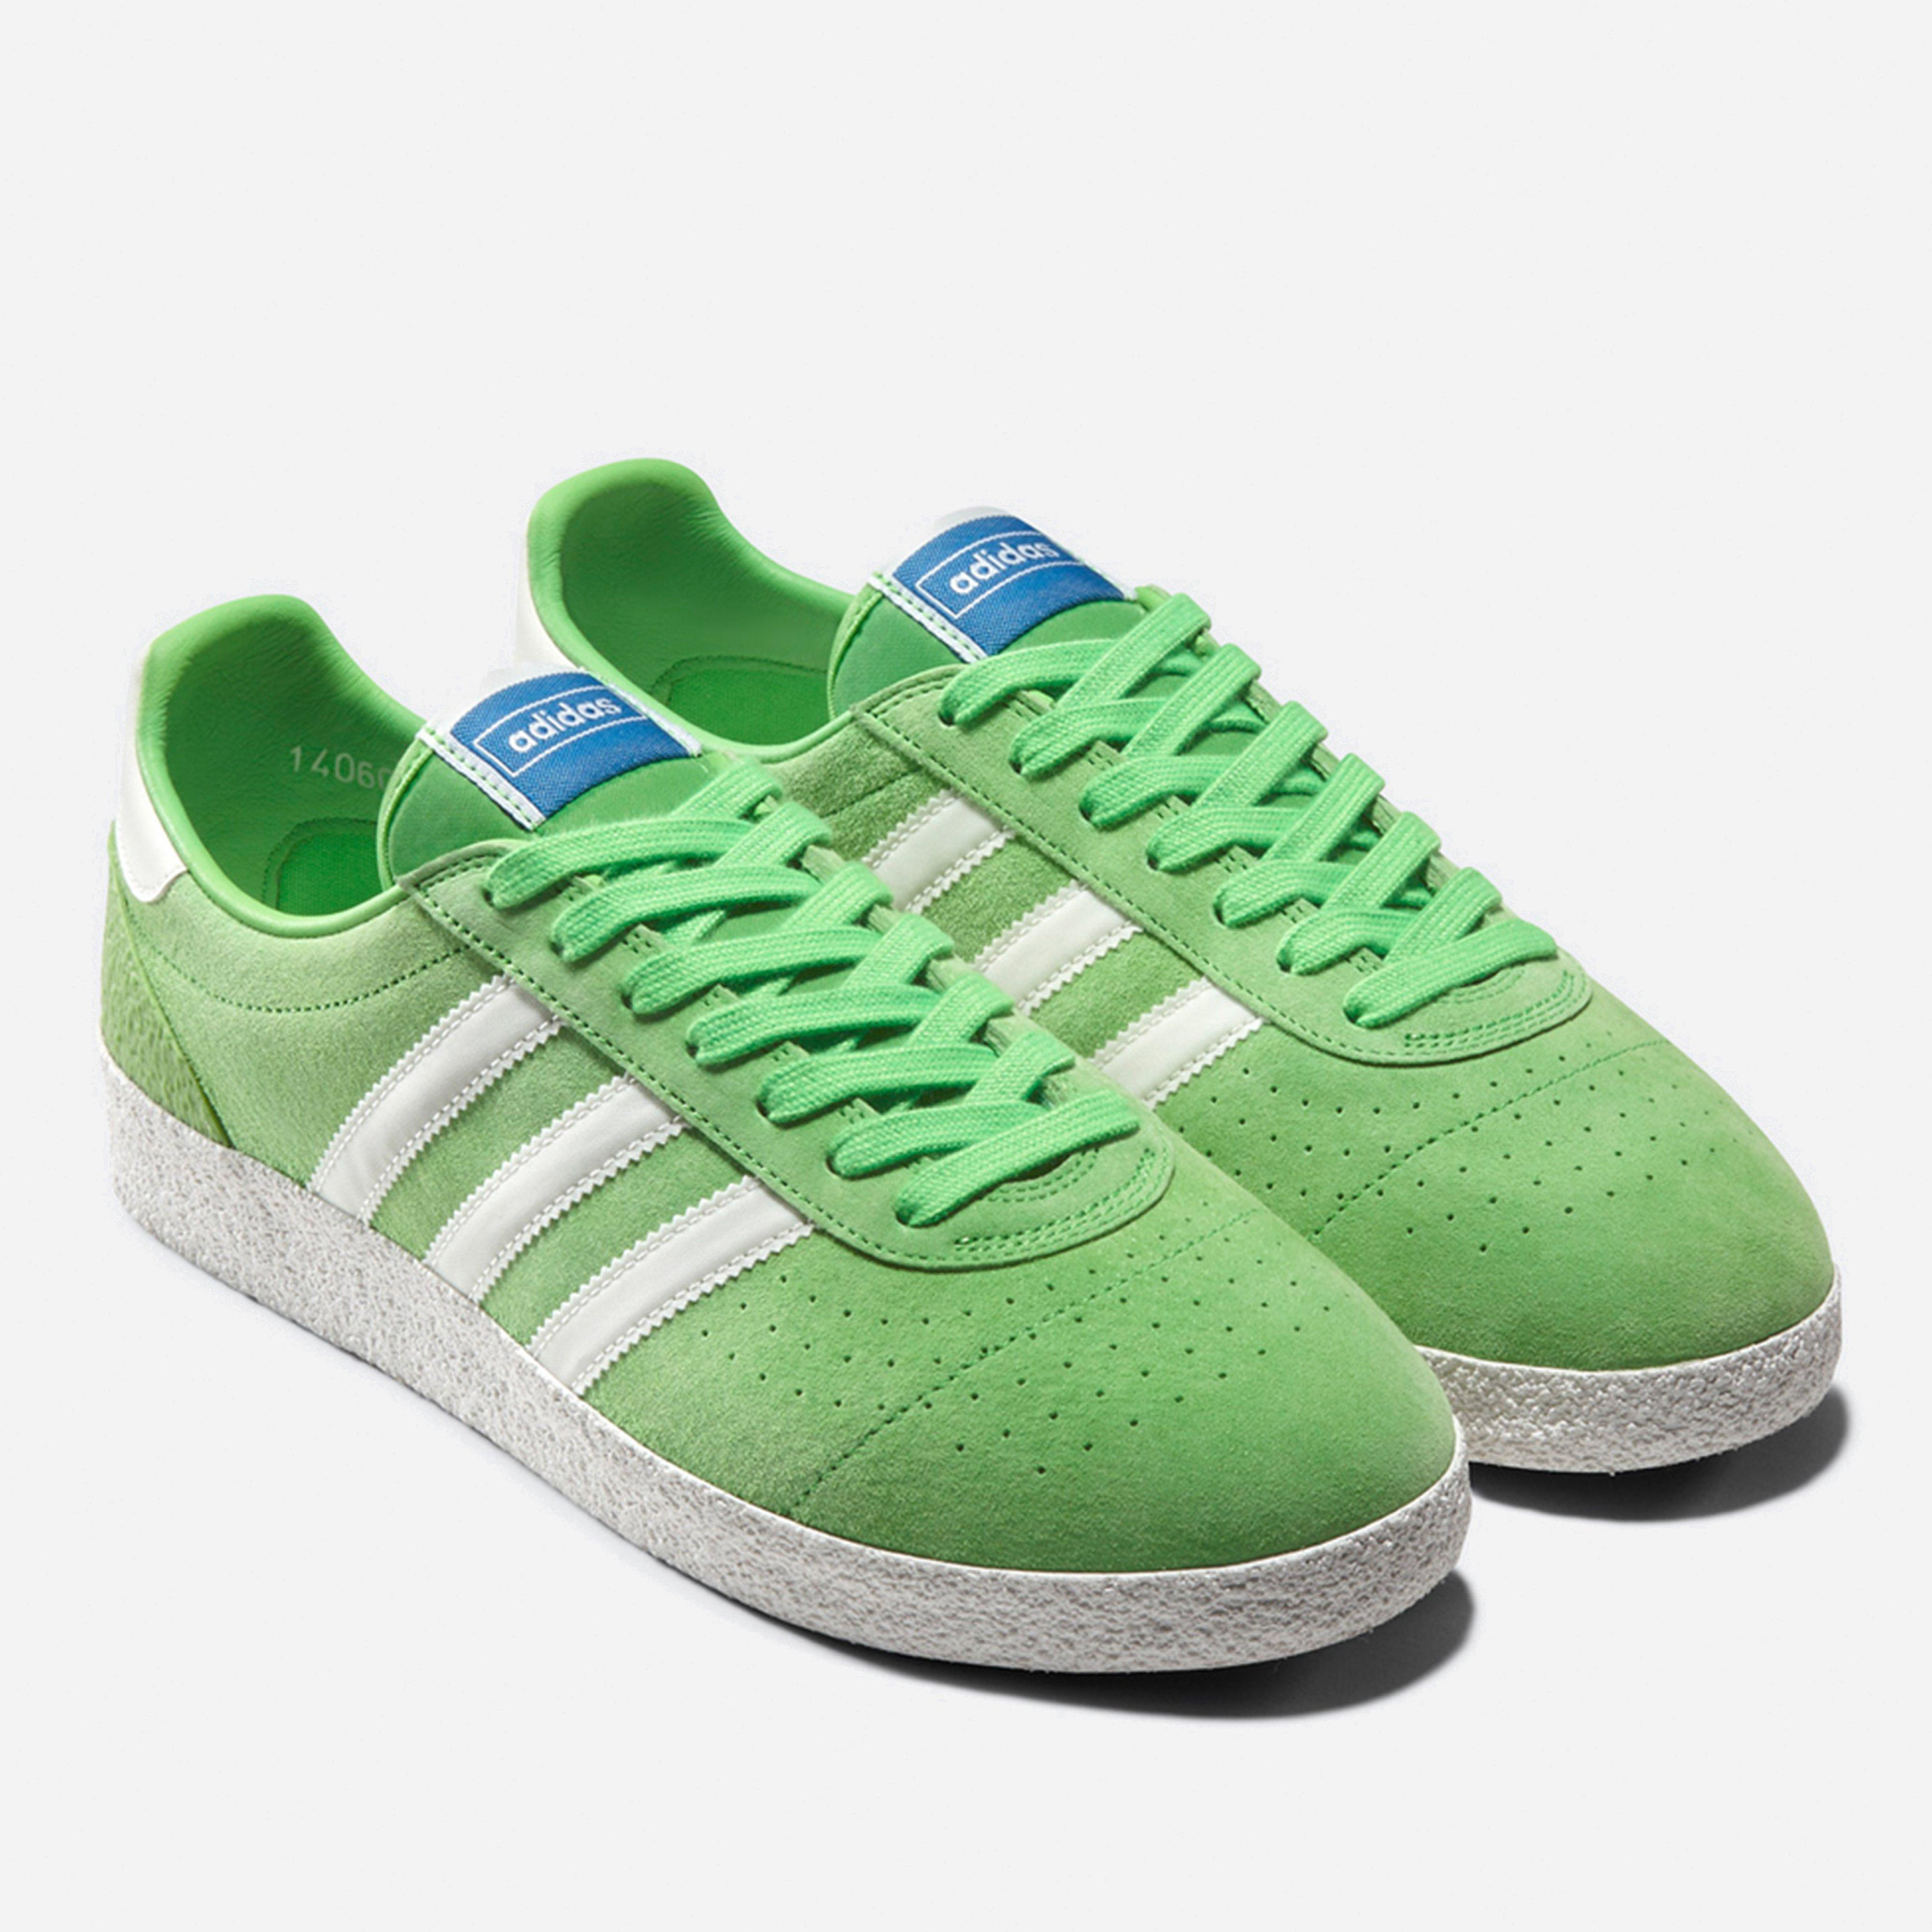 super cheap outlet store sale well known Adidas Originals Green Adidas Originals Munchen Spzl for men